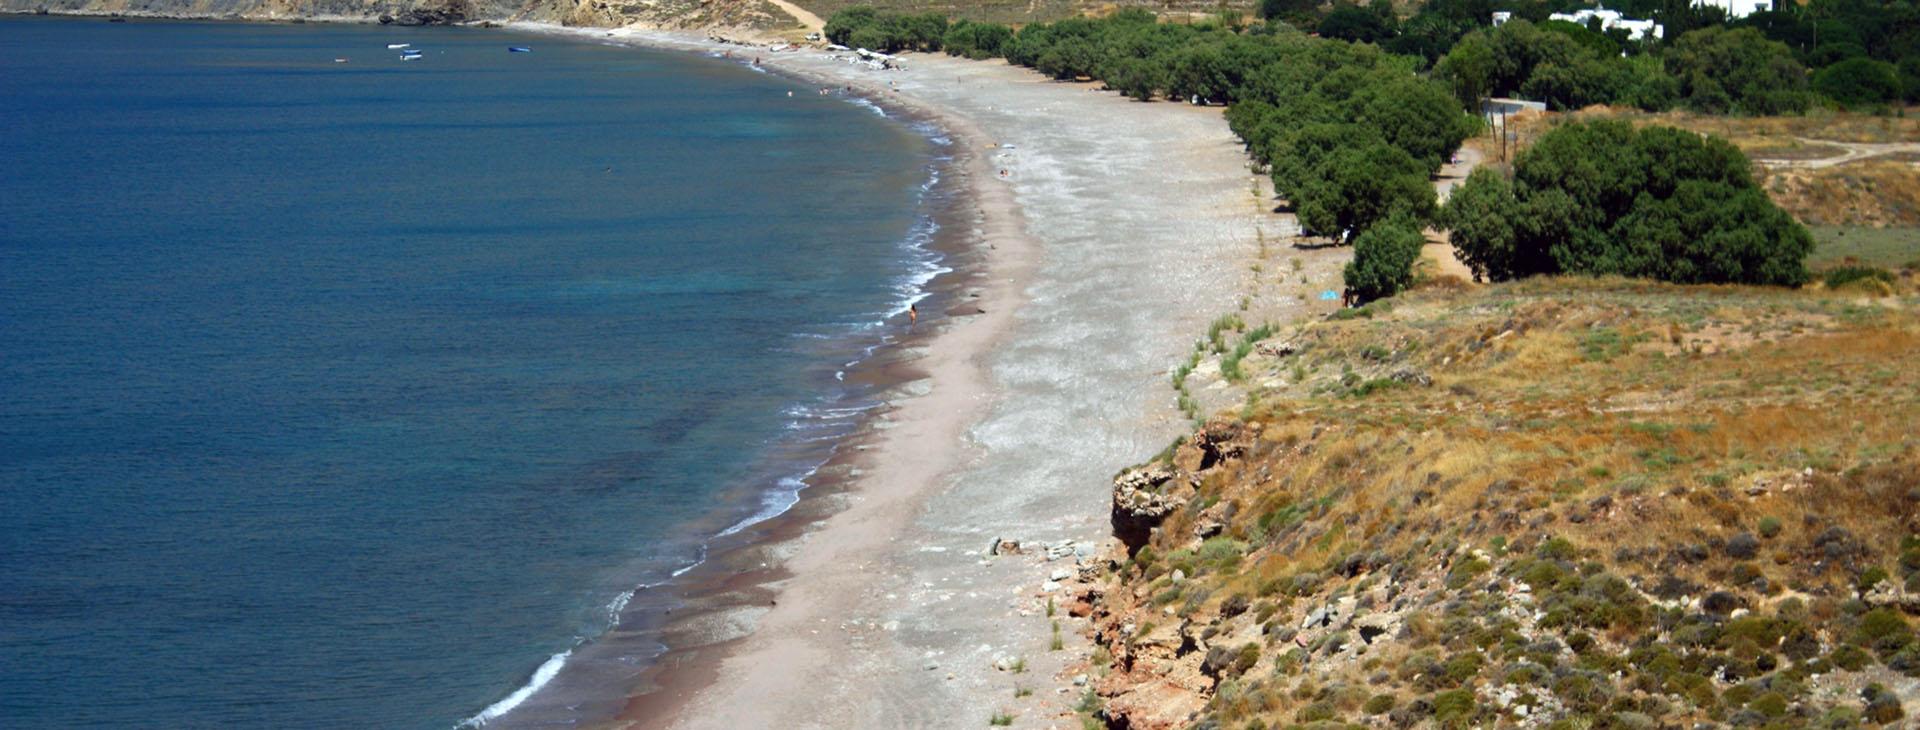 Eristos Beach, Tilos island